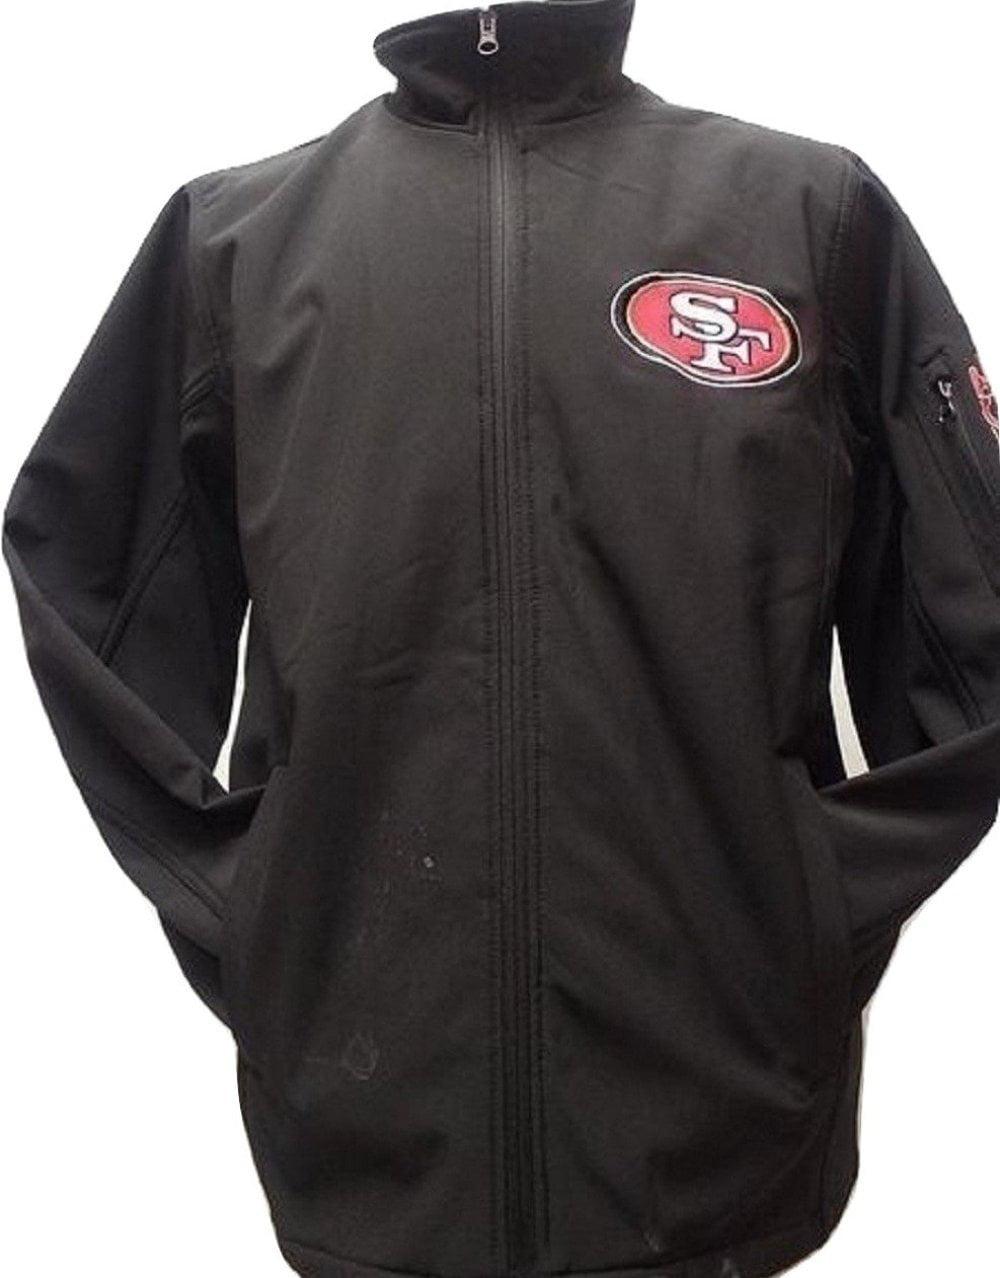 San Francisco 49ers Black Softshell Full Zip Jacket by G-III Sports